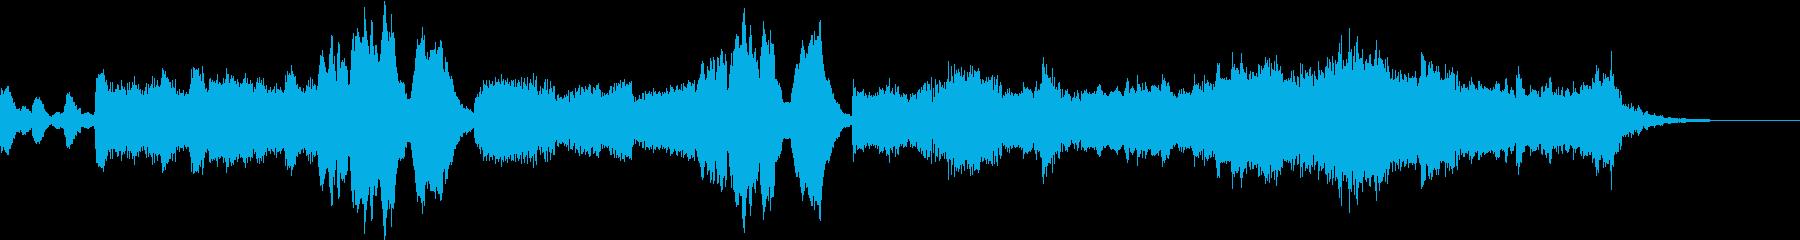 RPGのダンジョンで流れそうな曲の再生済みの波形